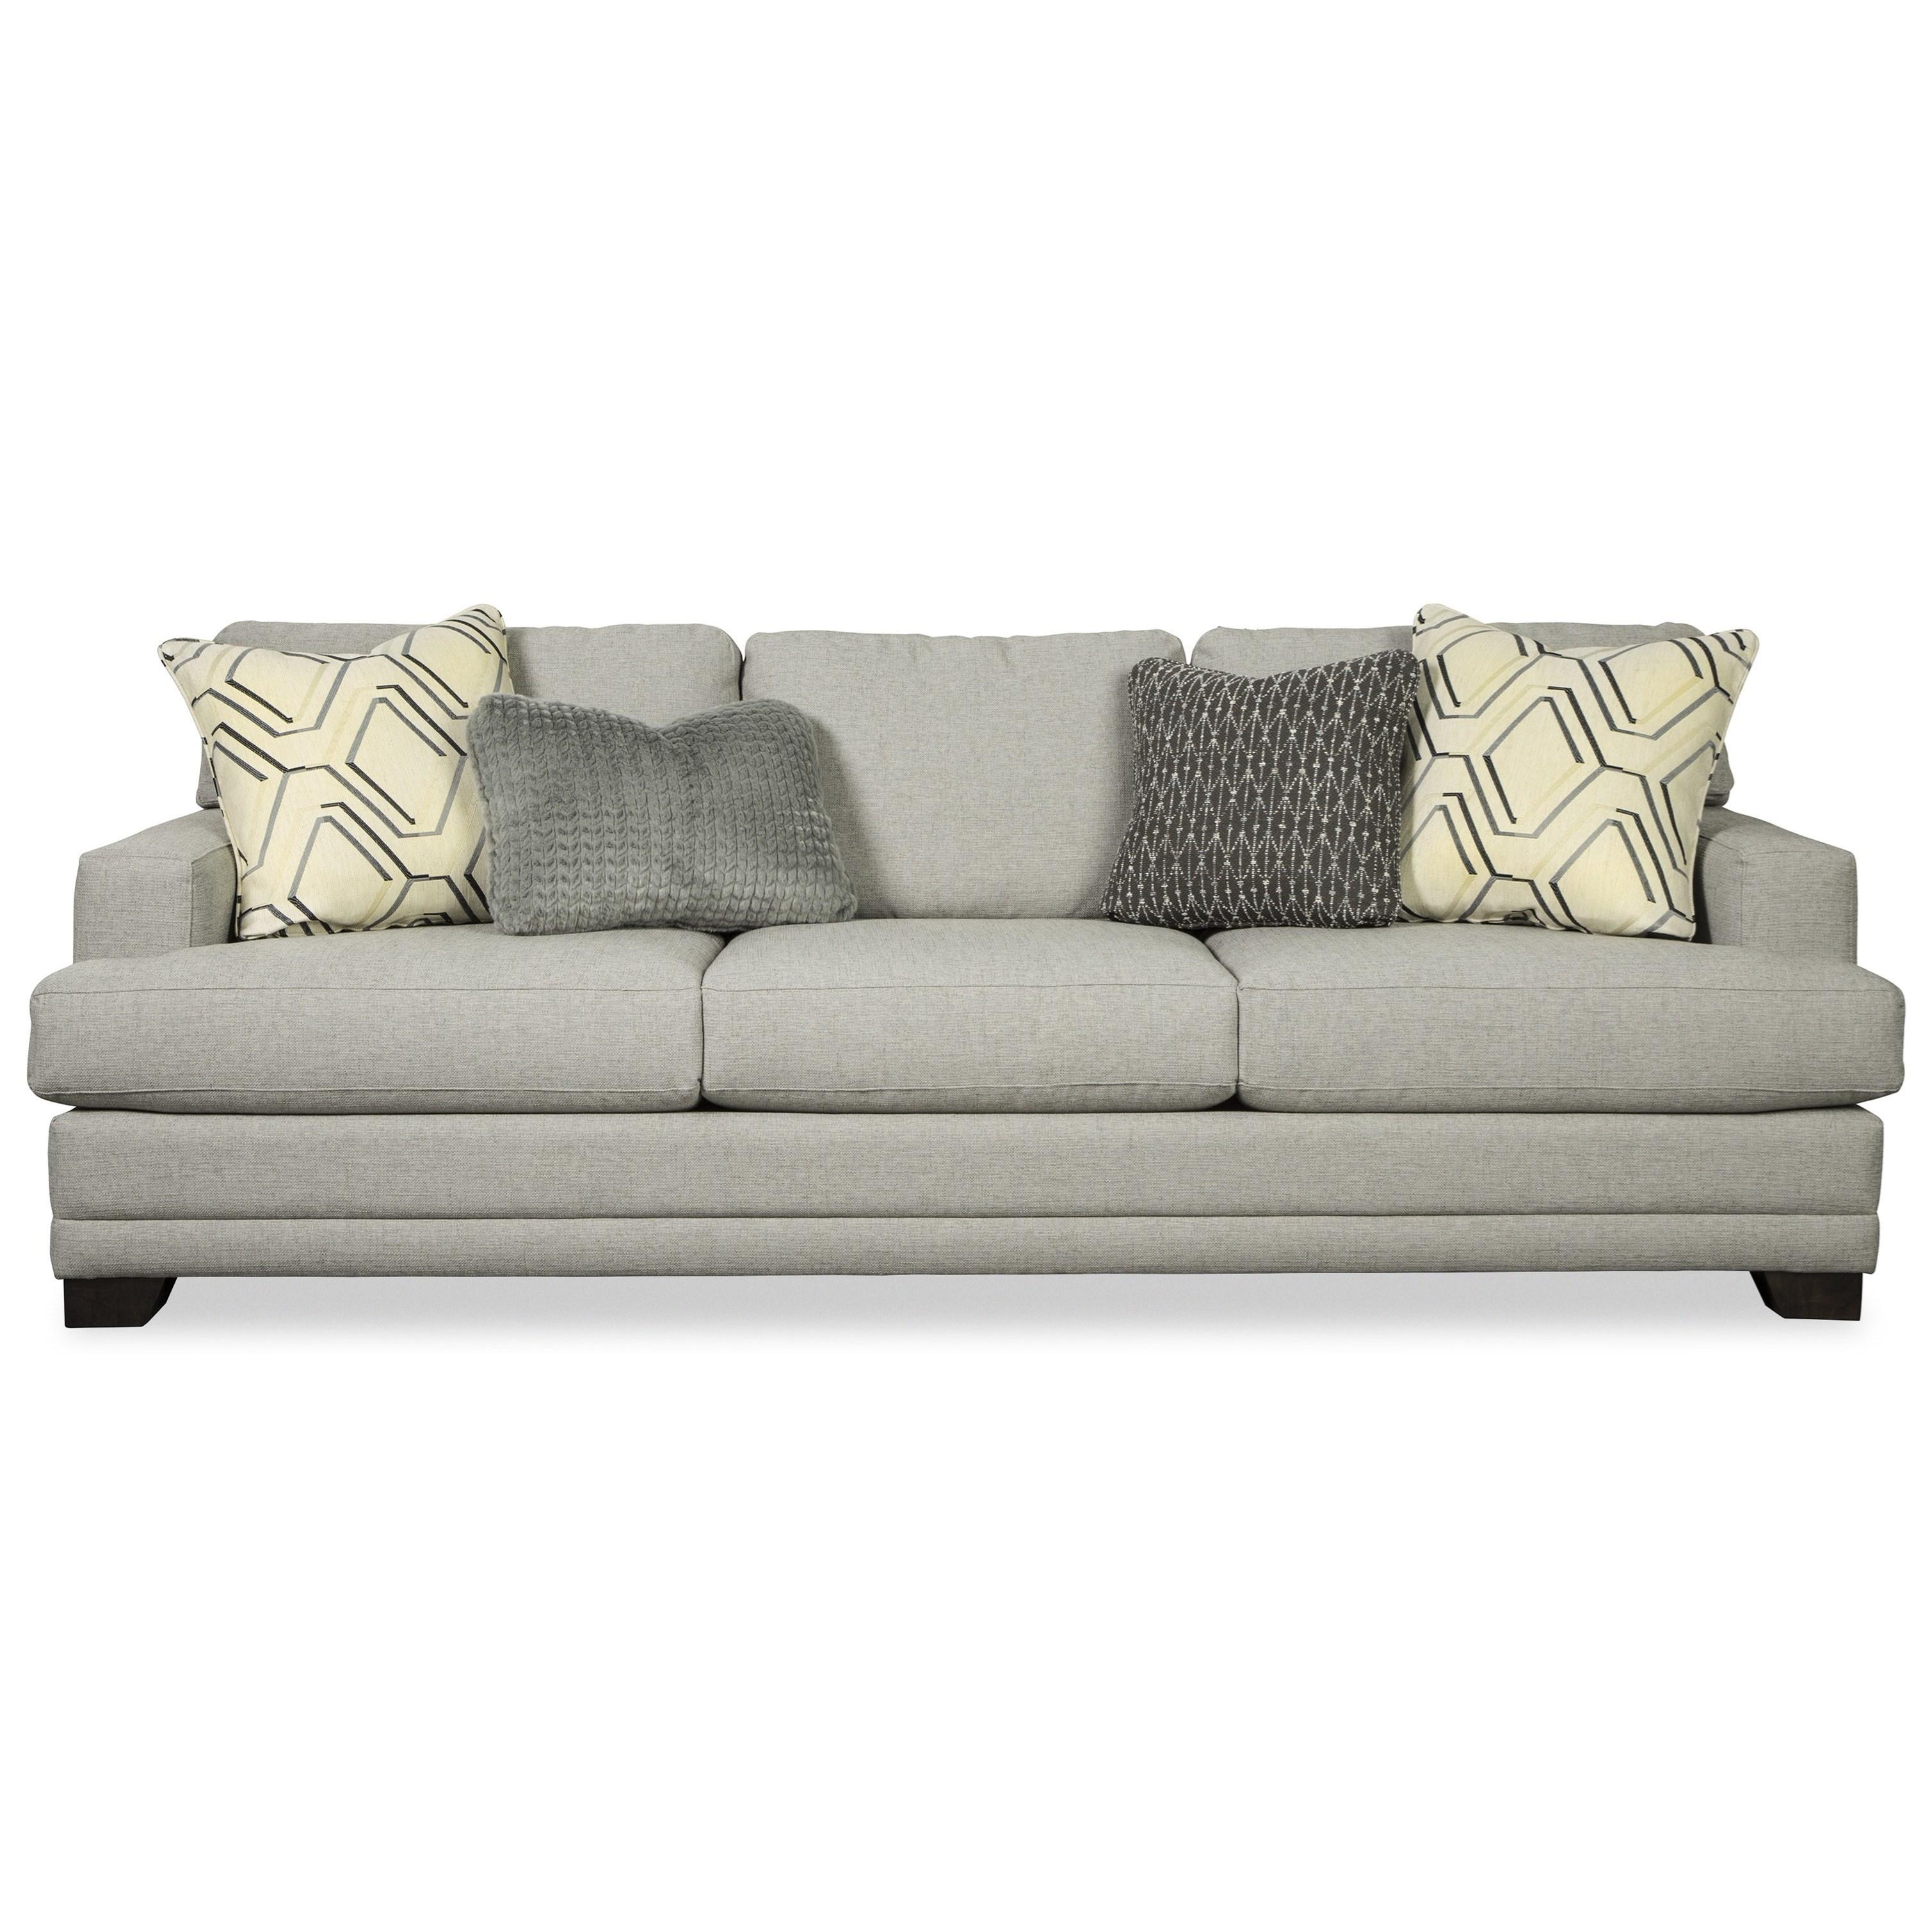 "Craftmaster 782650 Large 100"" Sofa With Deep Seats"